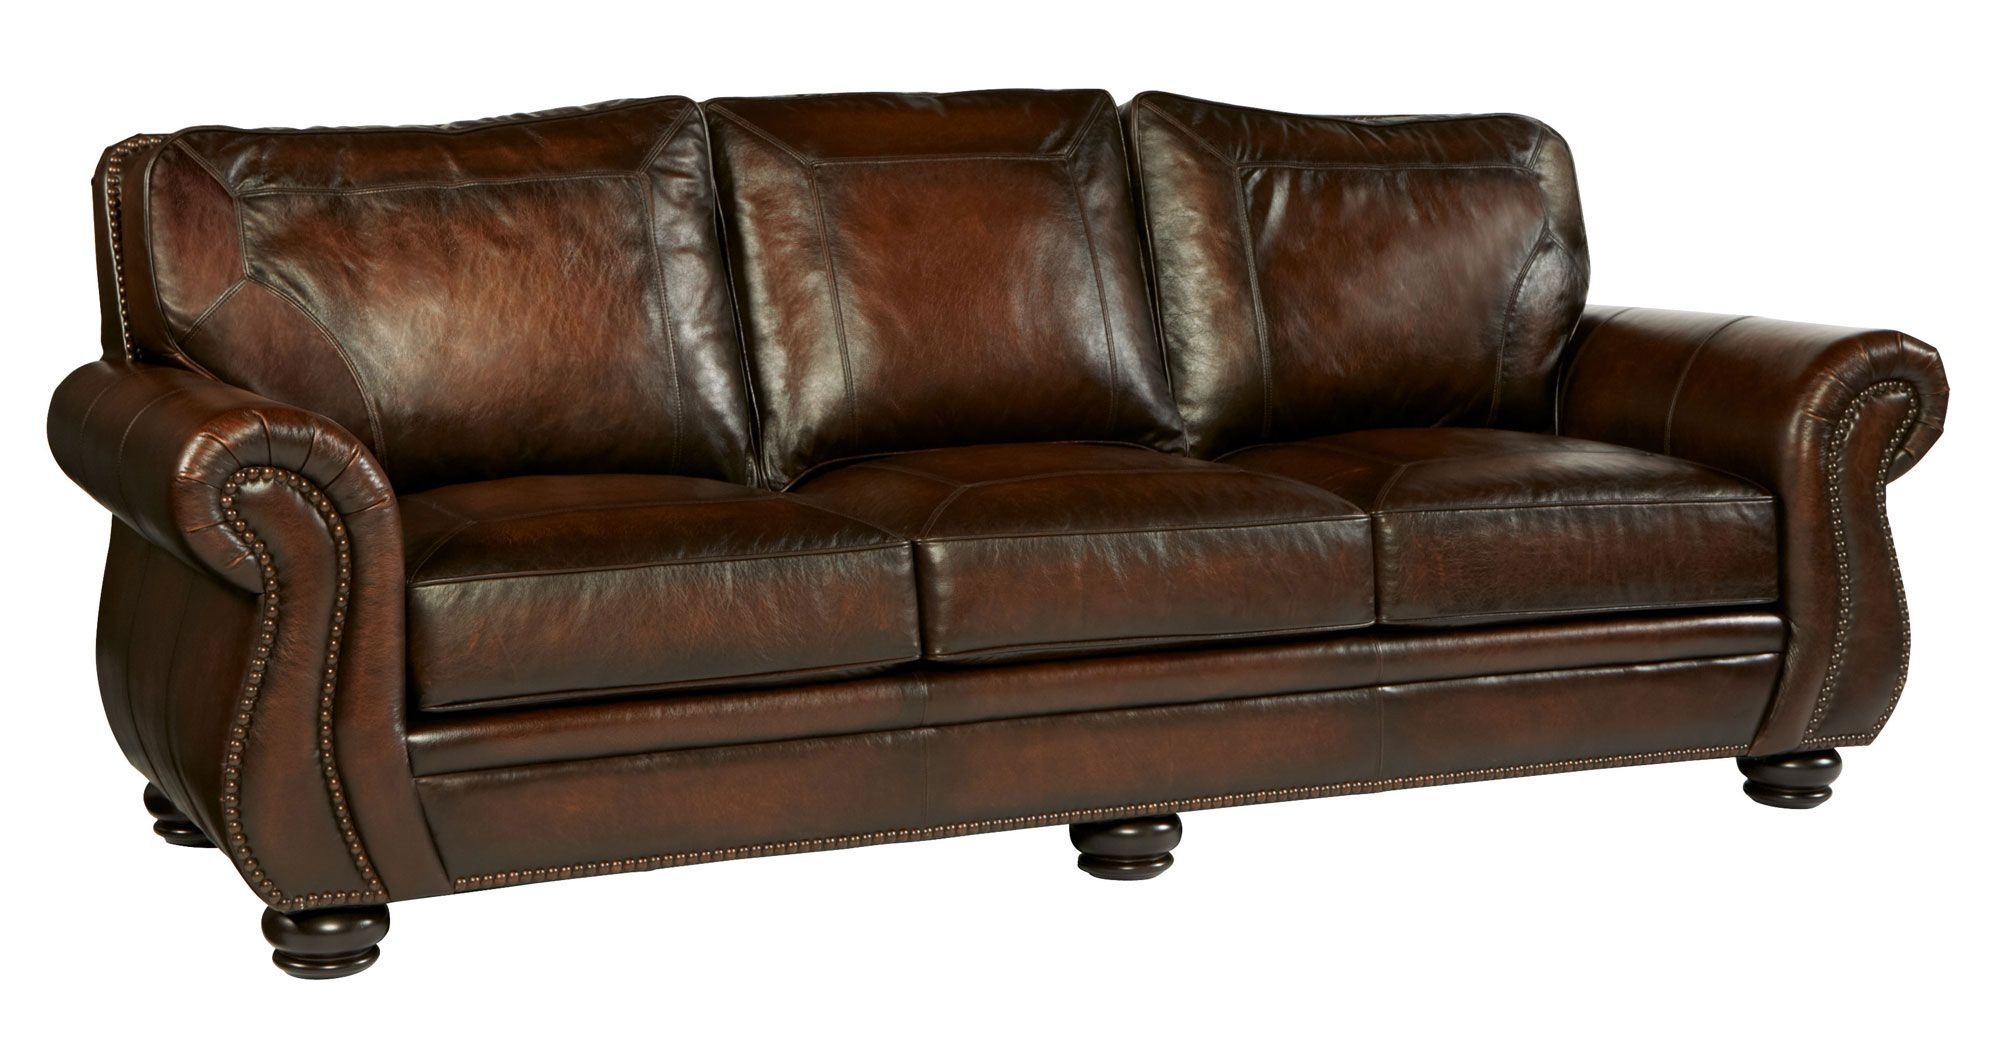 Bernhardt leather sofa reviews bernhardt winslow 100 for Bernhardt leather sectional sofa prices